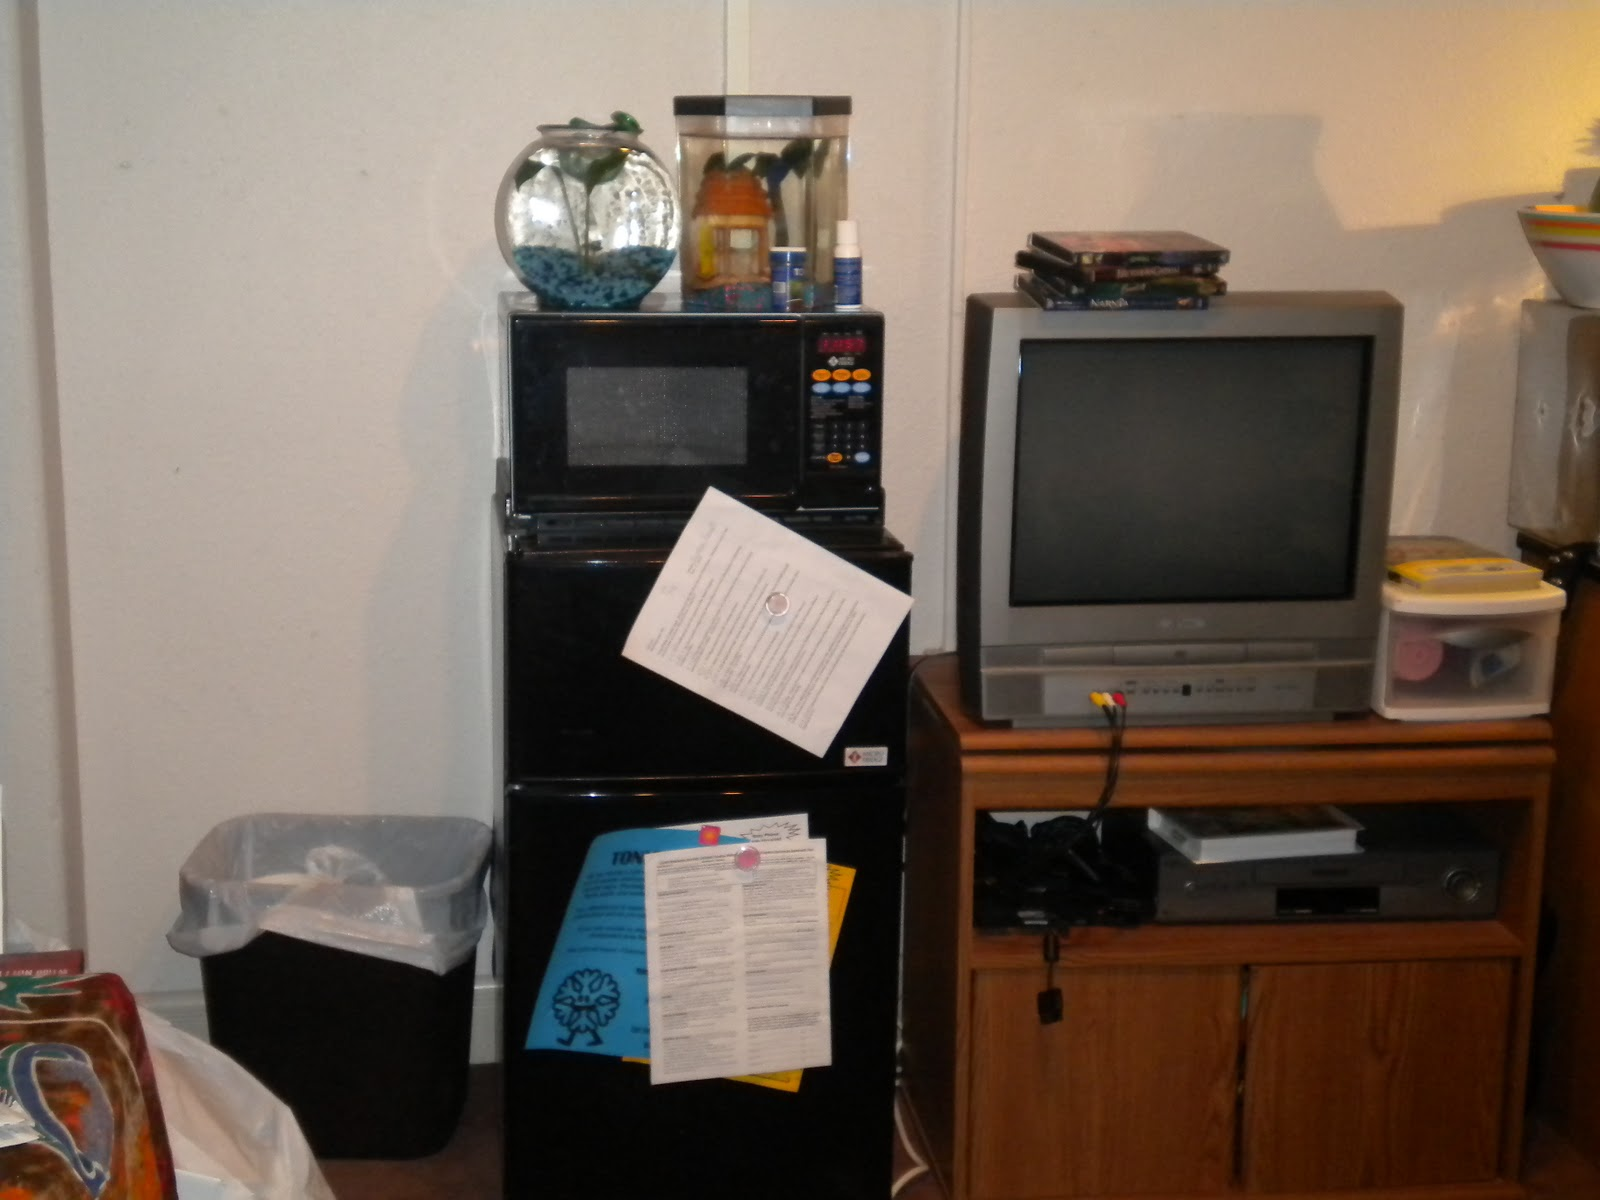 College life new dorm room set up Dorm room setups